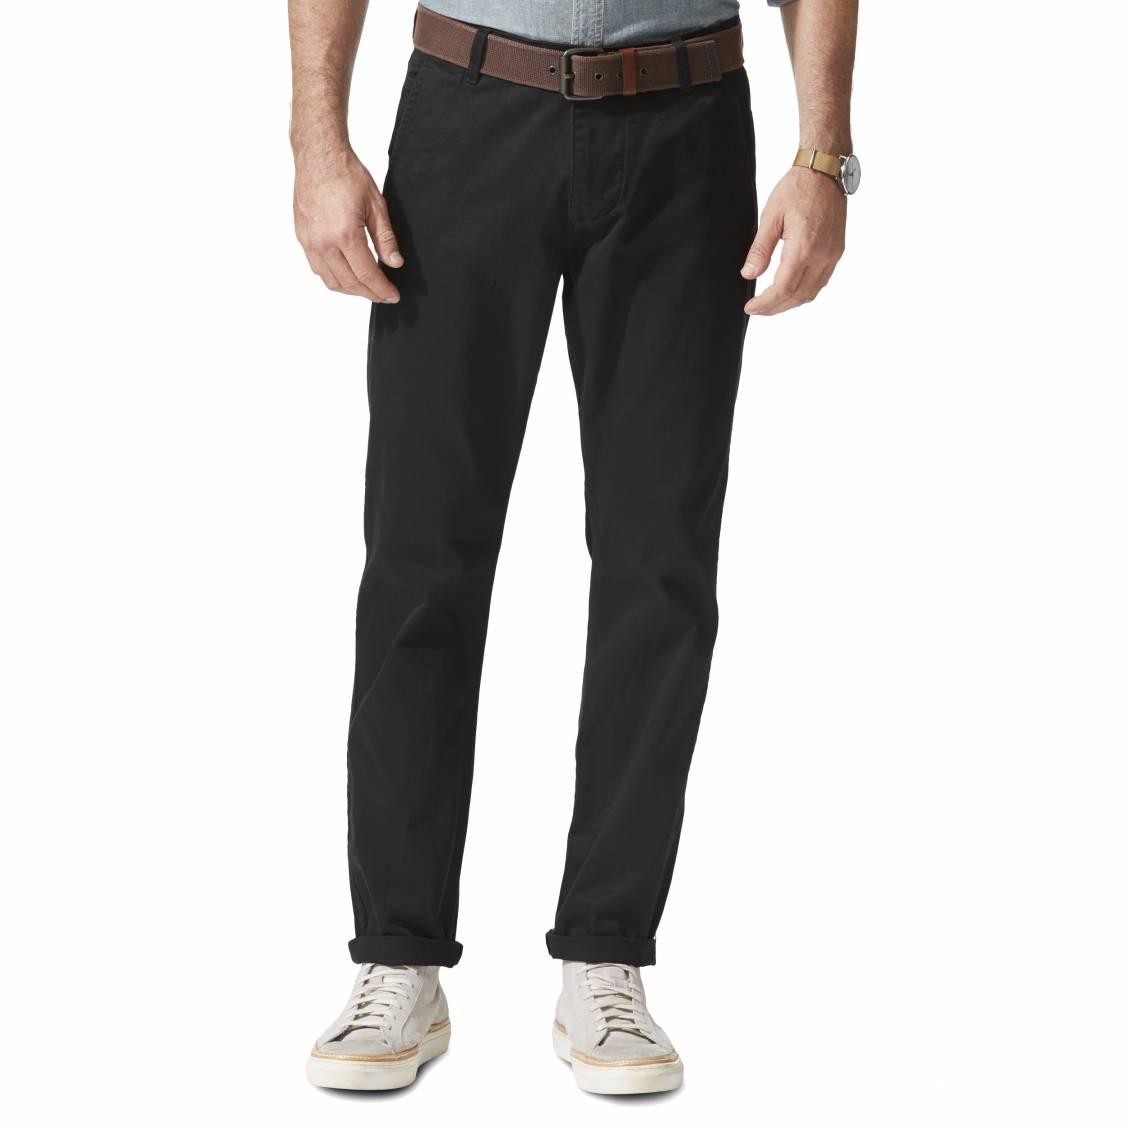 Pantalon alpha khaki original slim tapered  en twill noir